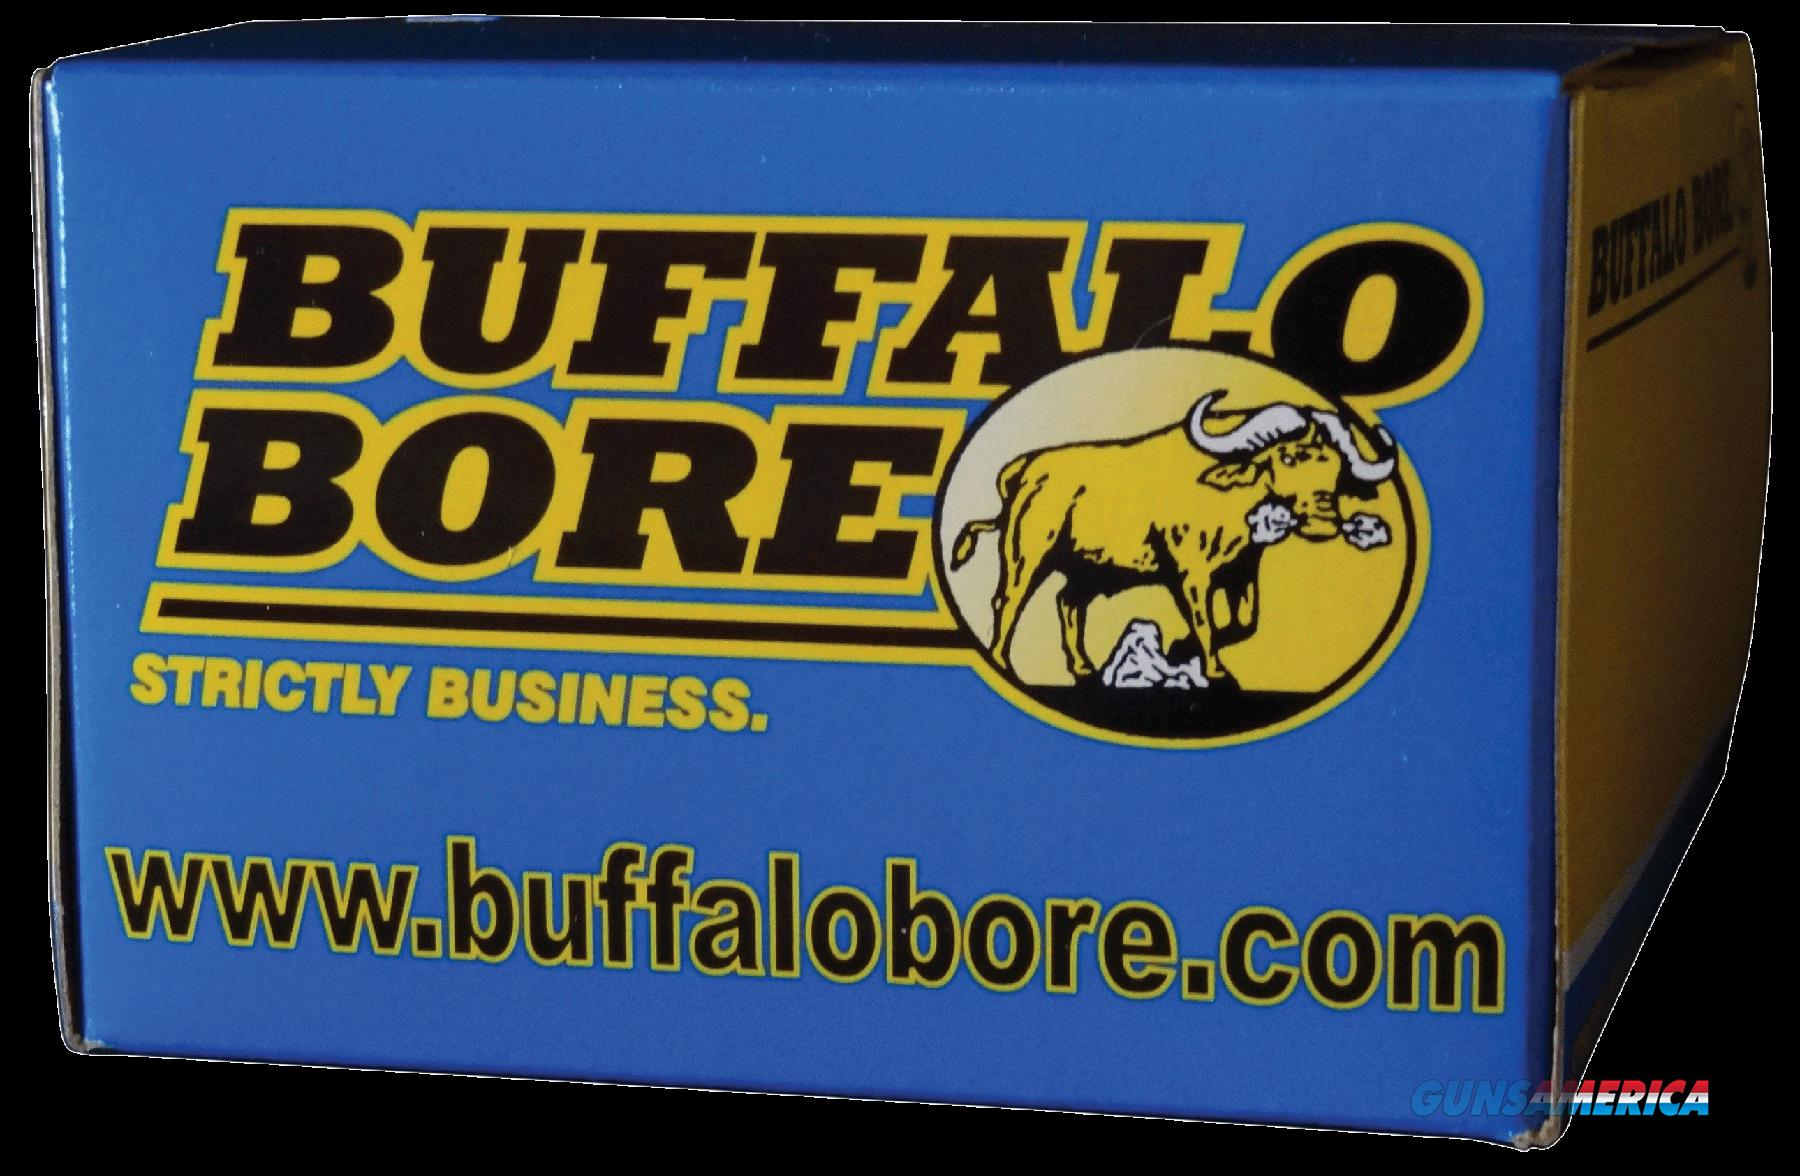 Buffalo Bore Ammunition Sniper, Bba S22377-20 223 77g Bthp Sniper   20-12  Guns > Pistols > 1911 Pistol Copies (non-Colt)